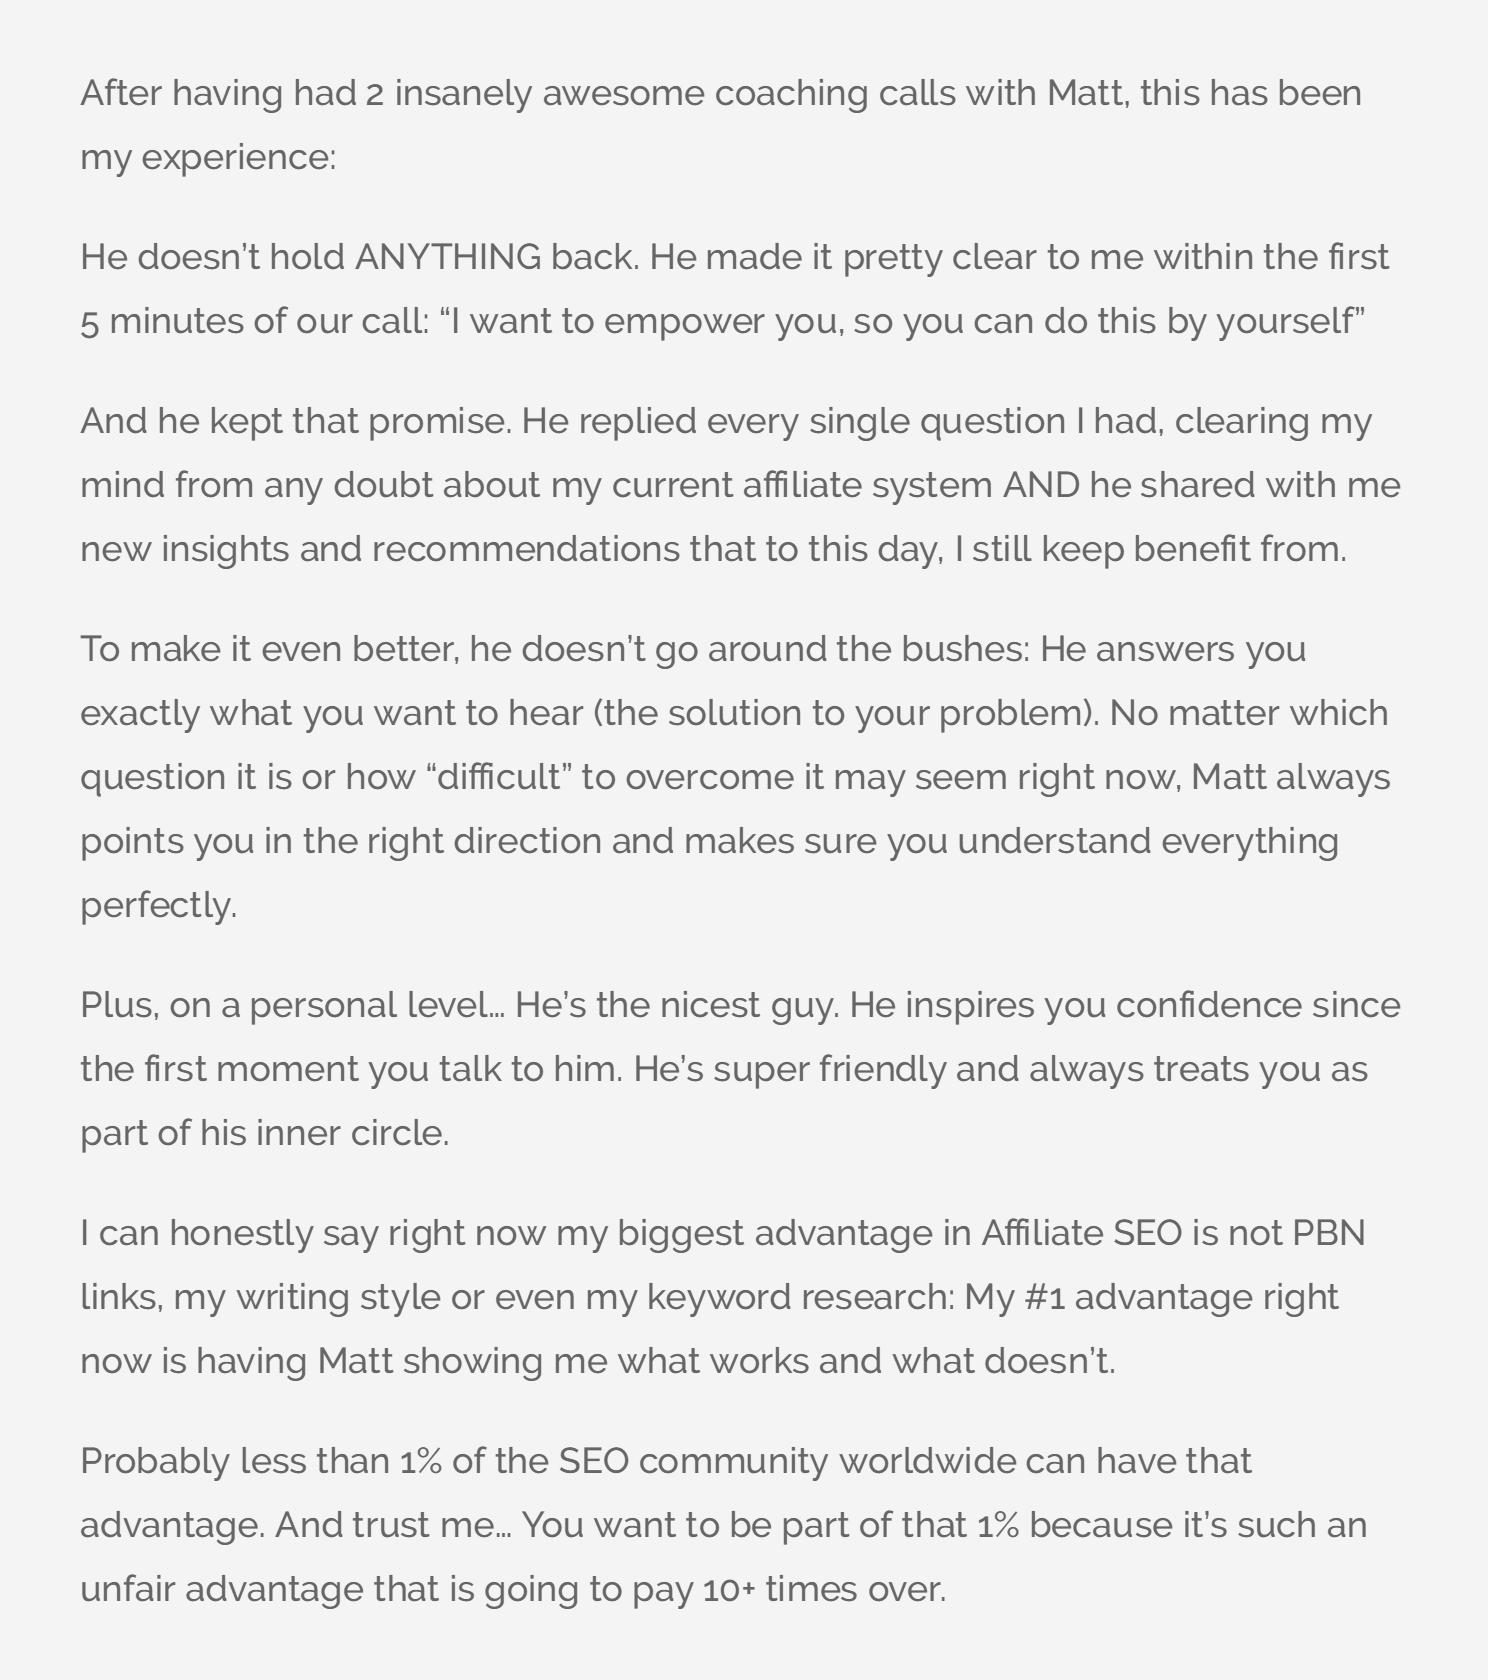 Jorge Luis's testimonial